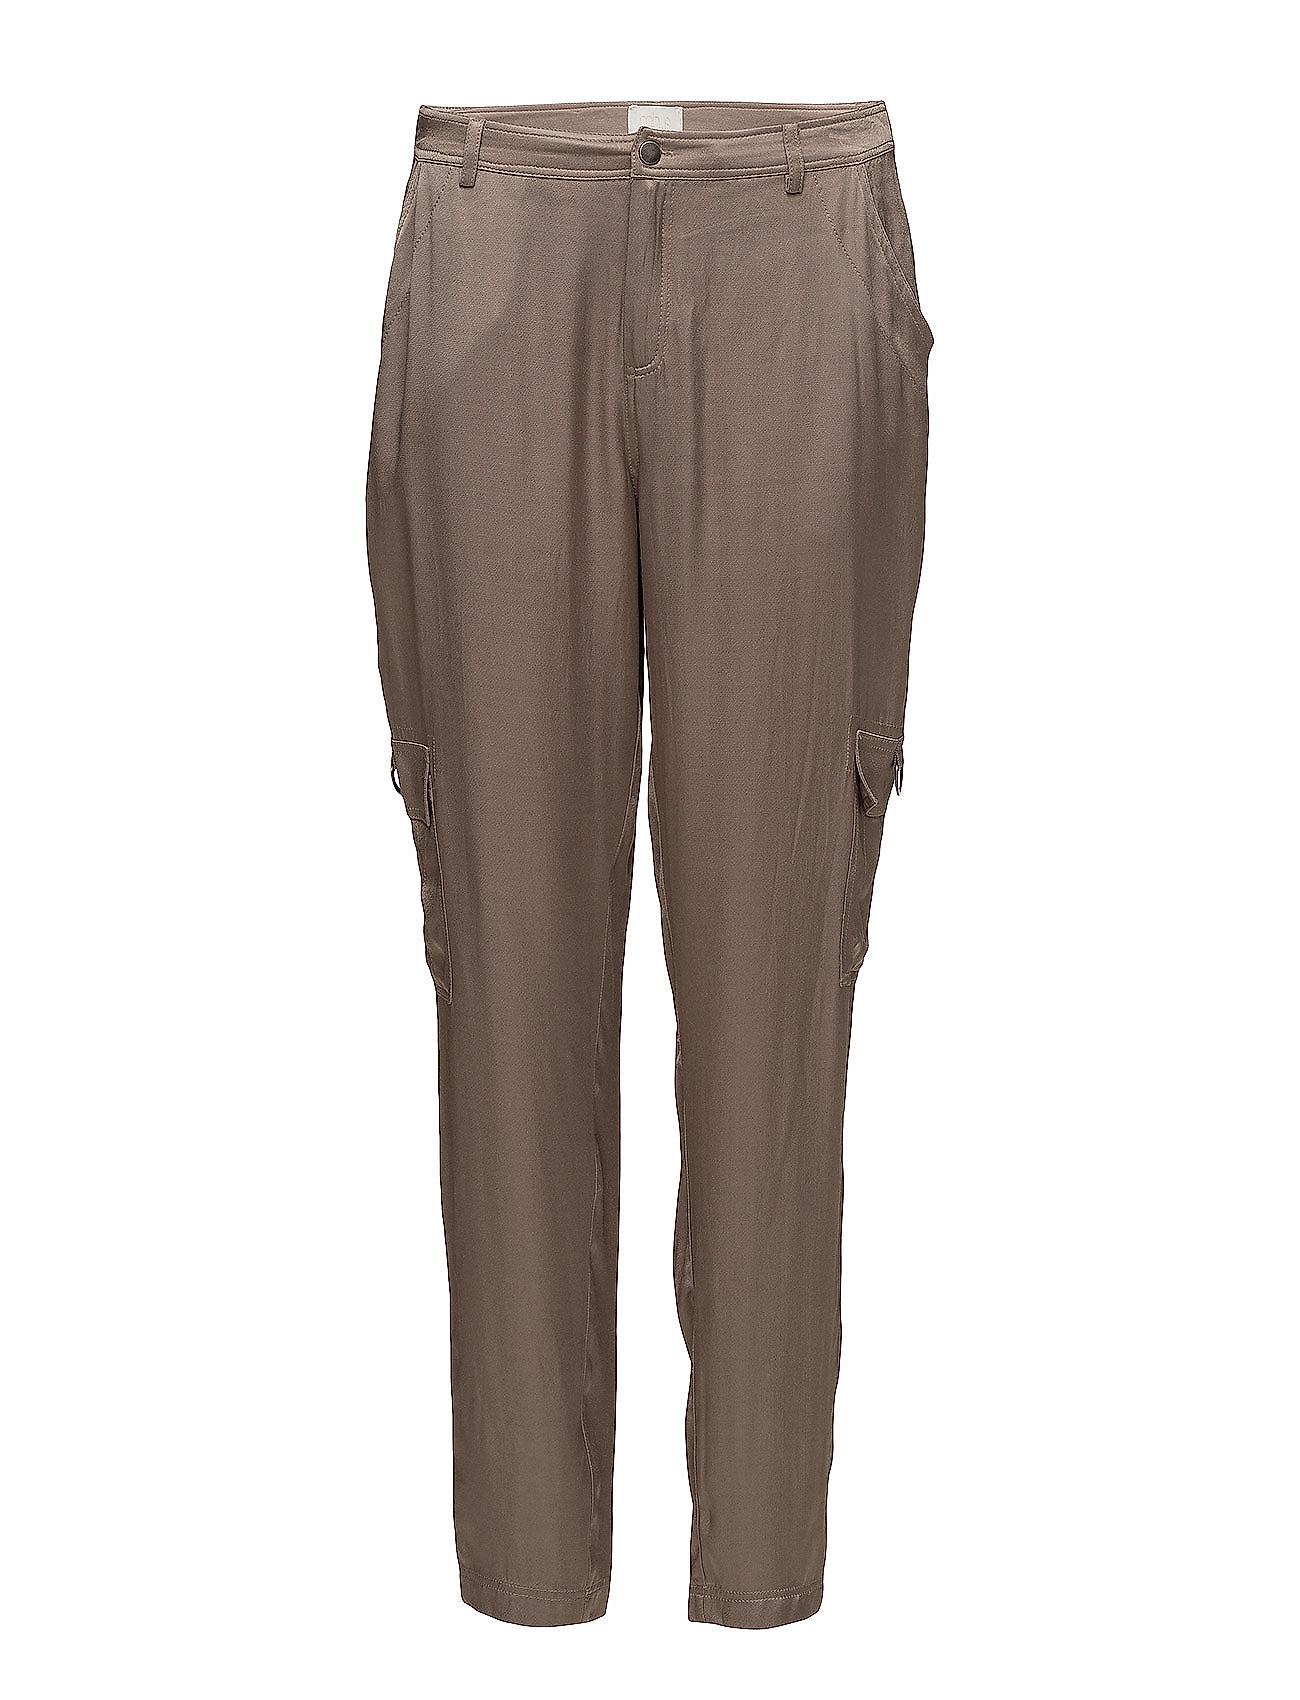 Minus Anthonia pants - FOSSIL